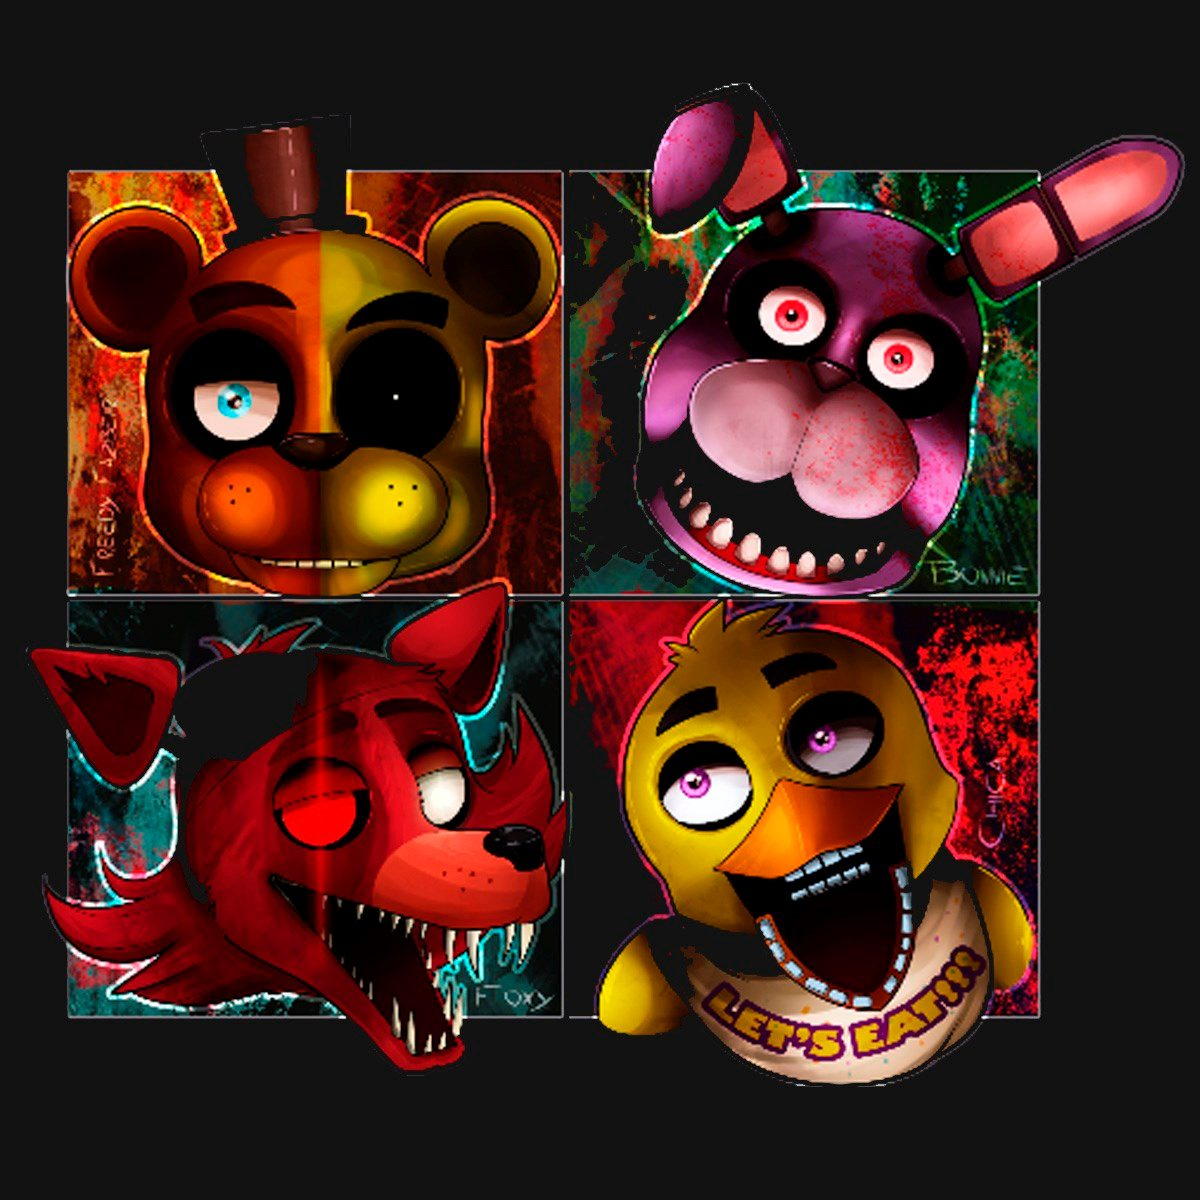 Five Nights At Freddy S Amino: Five Nights At Freddy's Colección 2016